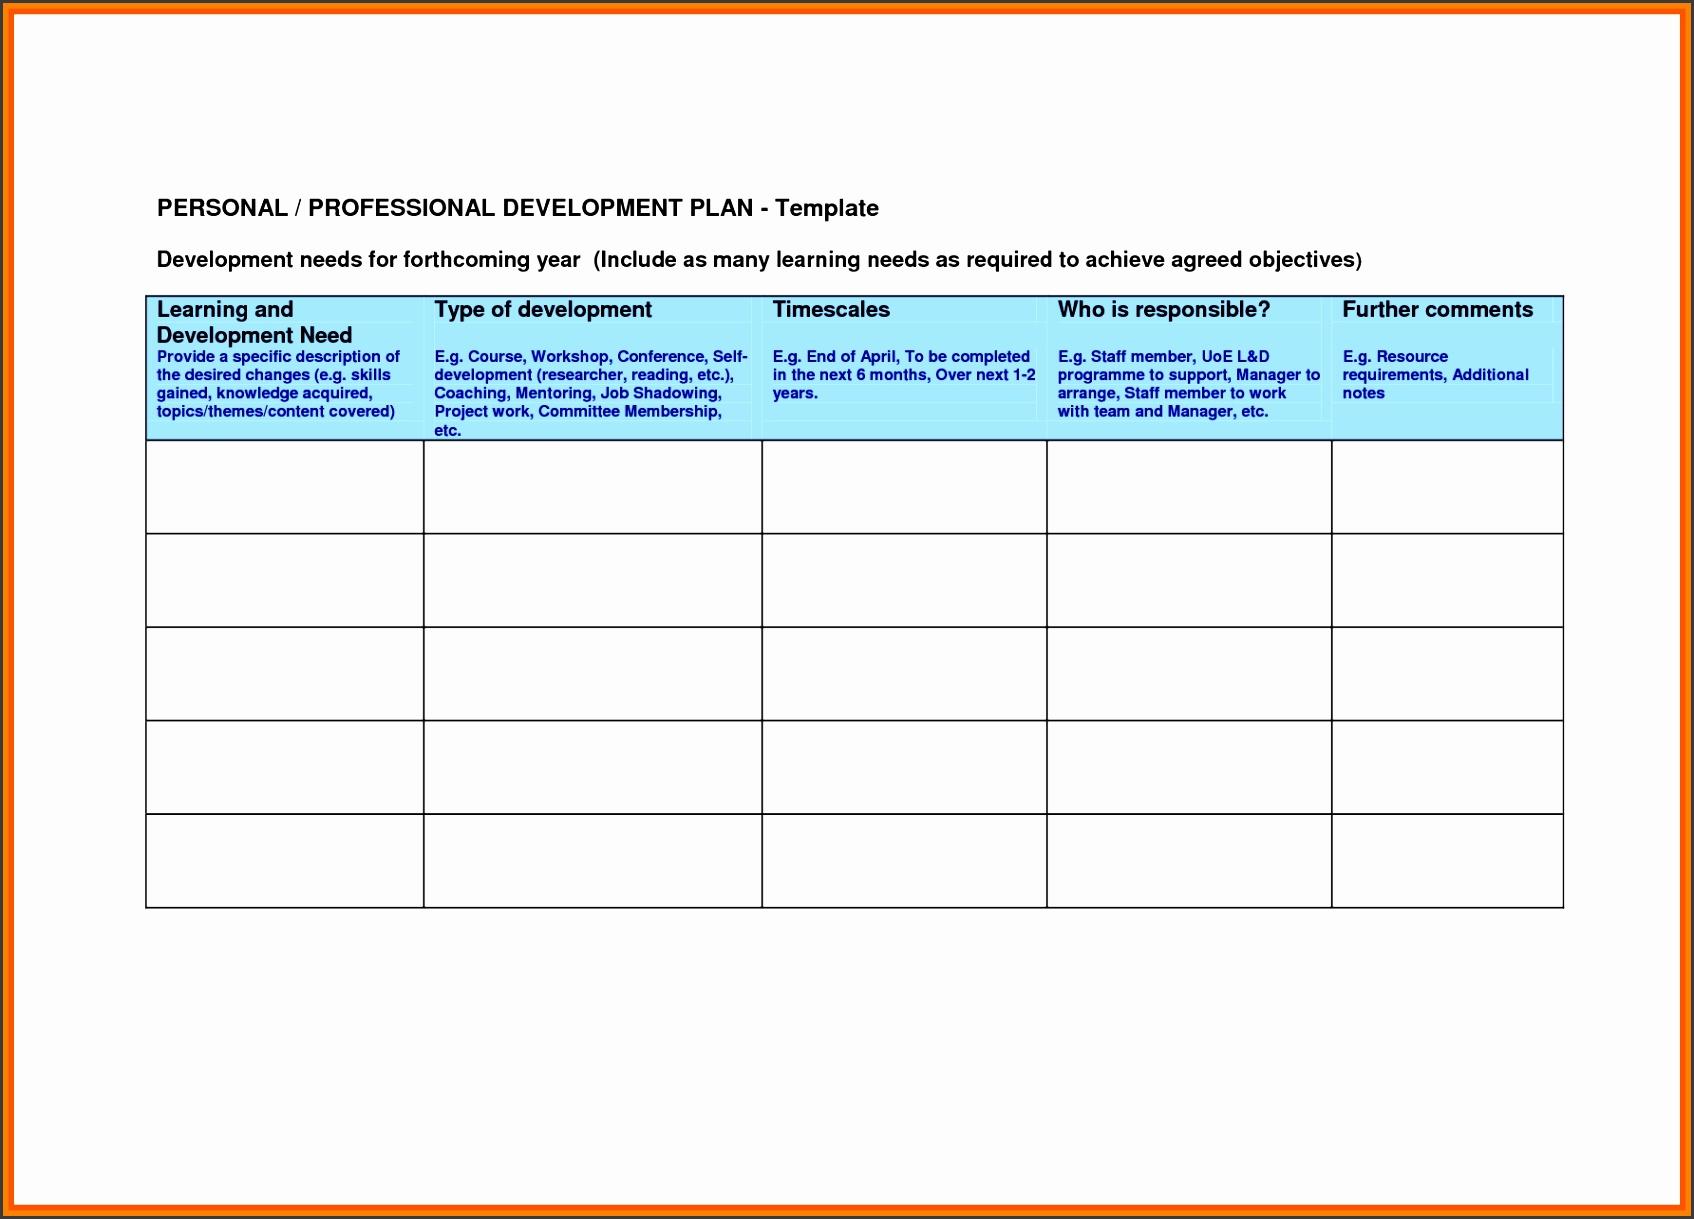 professional development plan templatevelopment plan template professional development plan template re3euveo